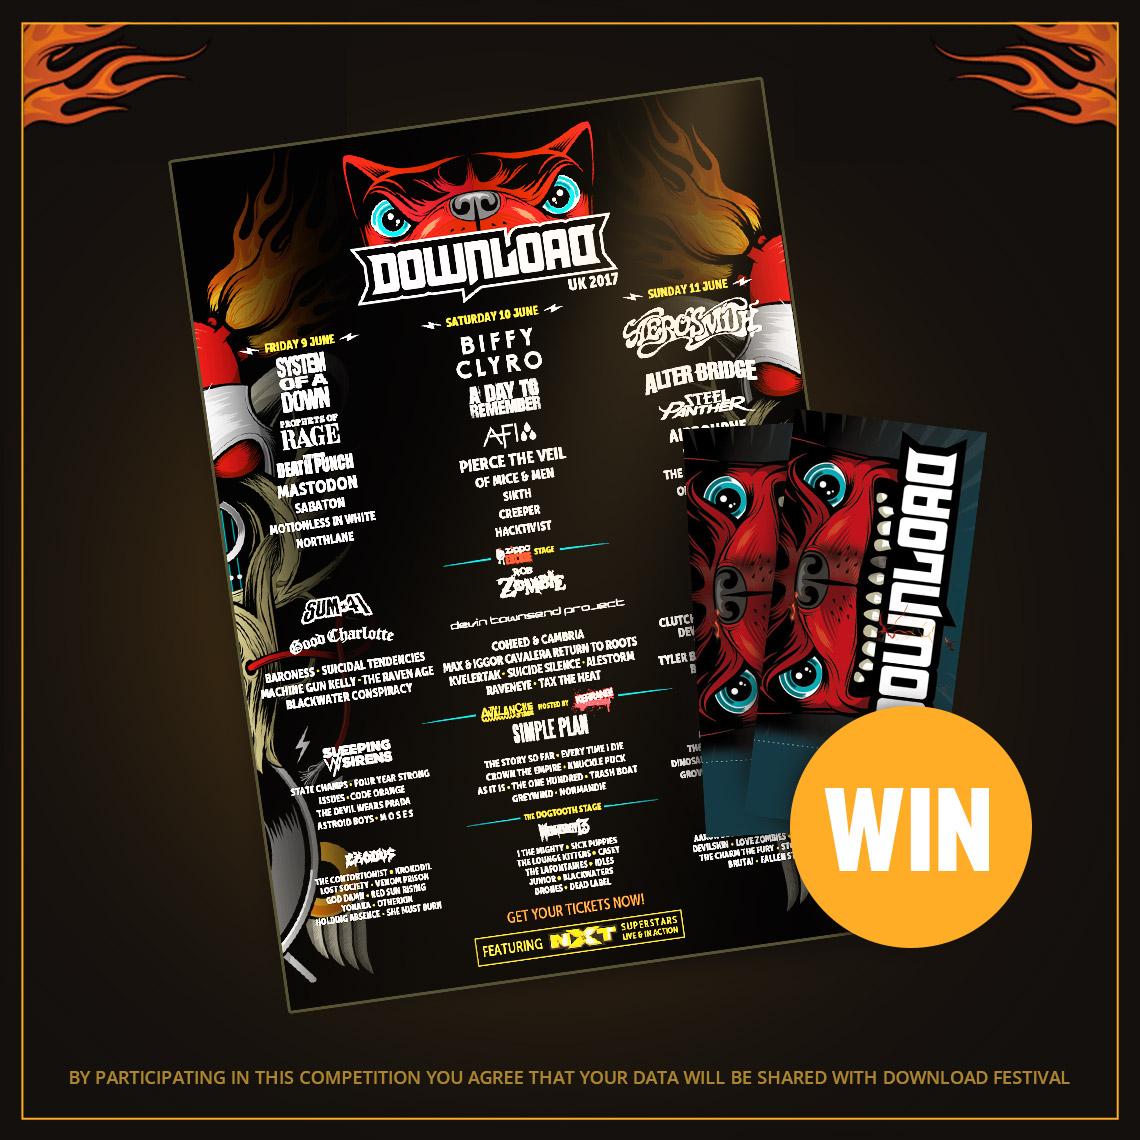 Win 2x Tickets for Download Festival 2017 - Impericon com UK